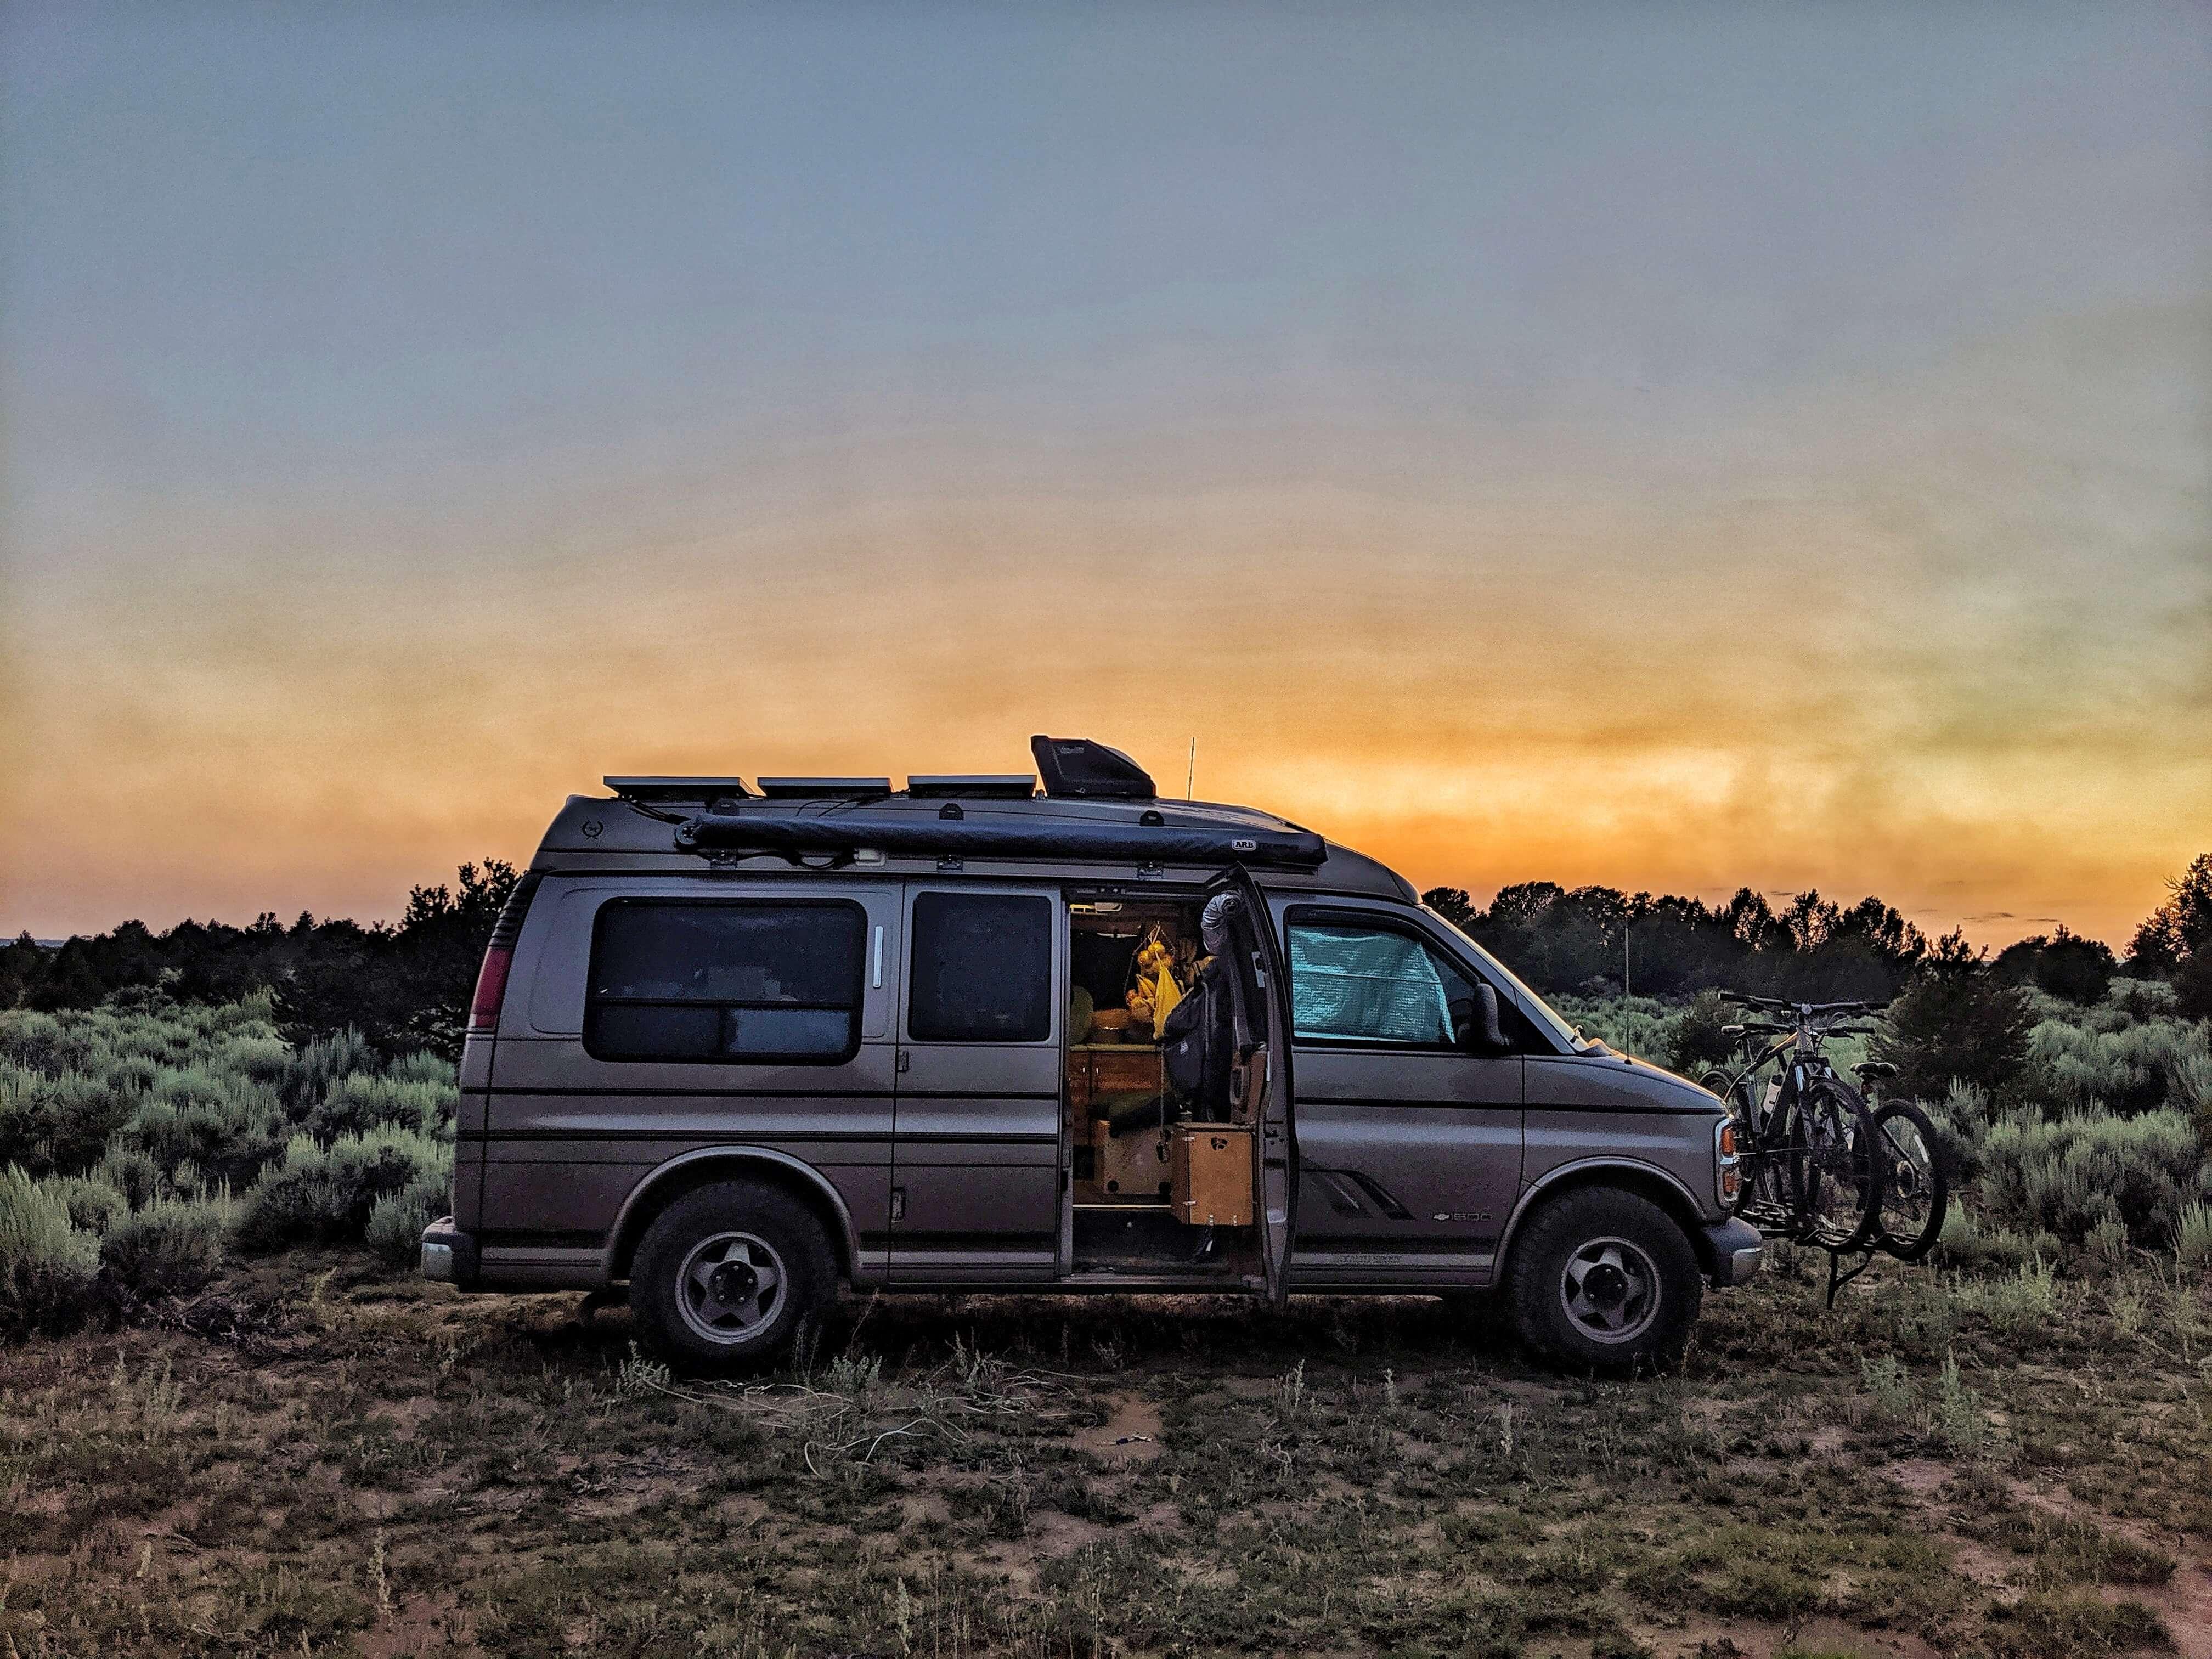 gnomad home conversion camper van photos diy van build guide blog instagram exterior